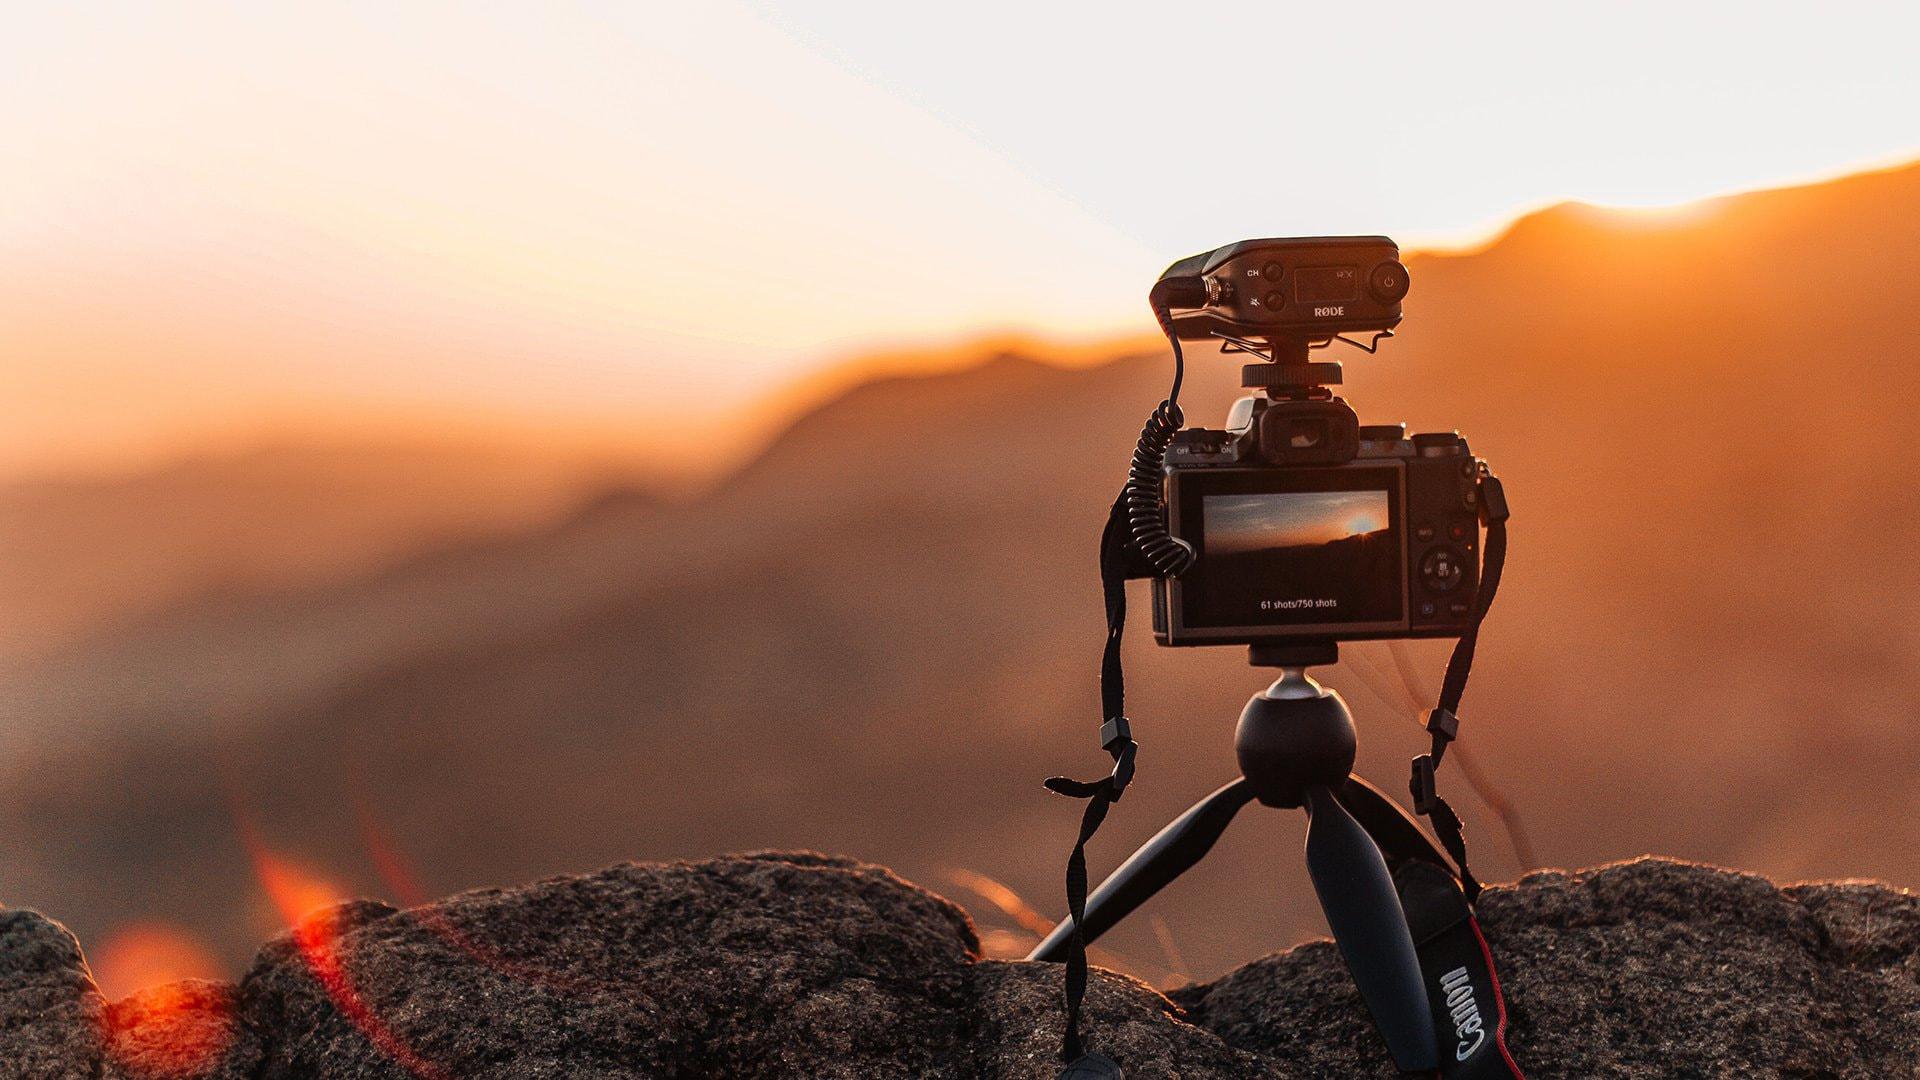 Camera on a tripod taking a photo of sunset